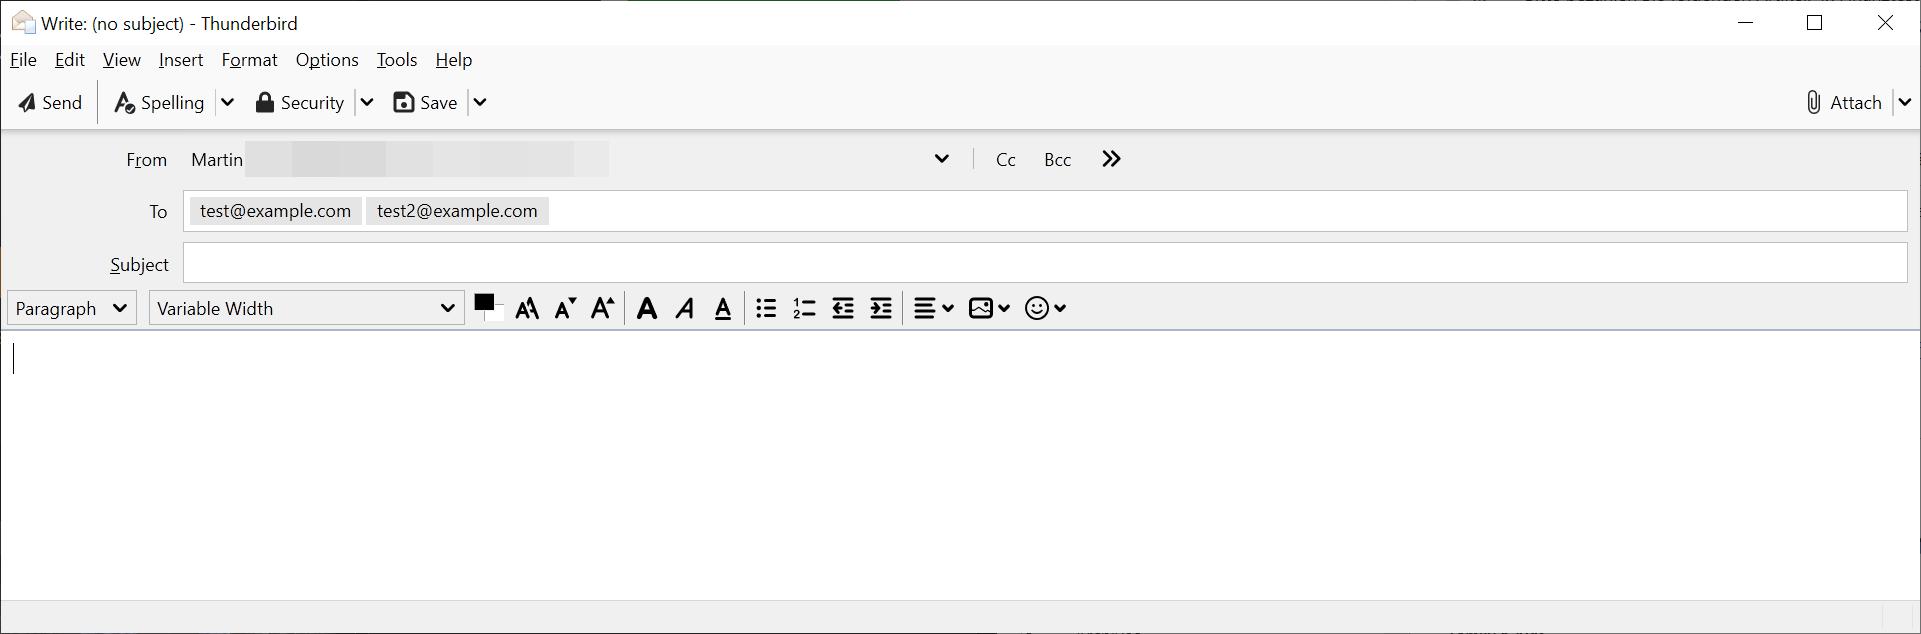 thunderbird multiple emails per line